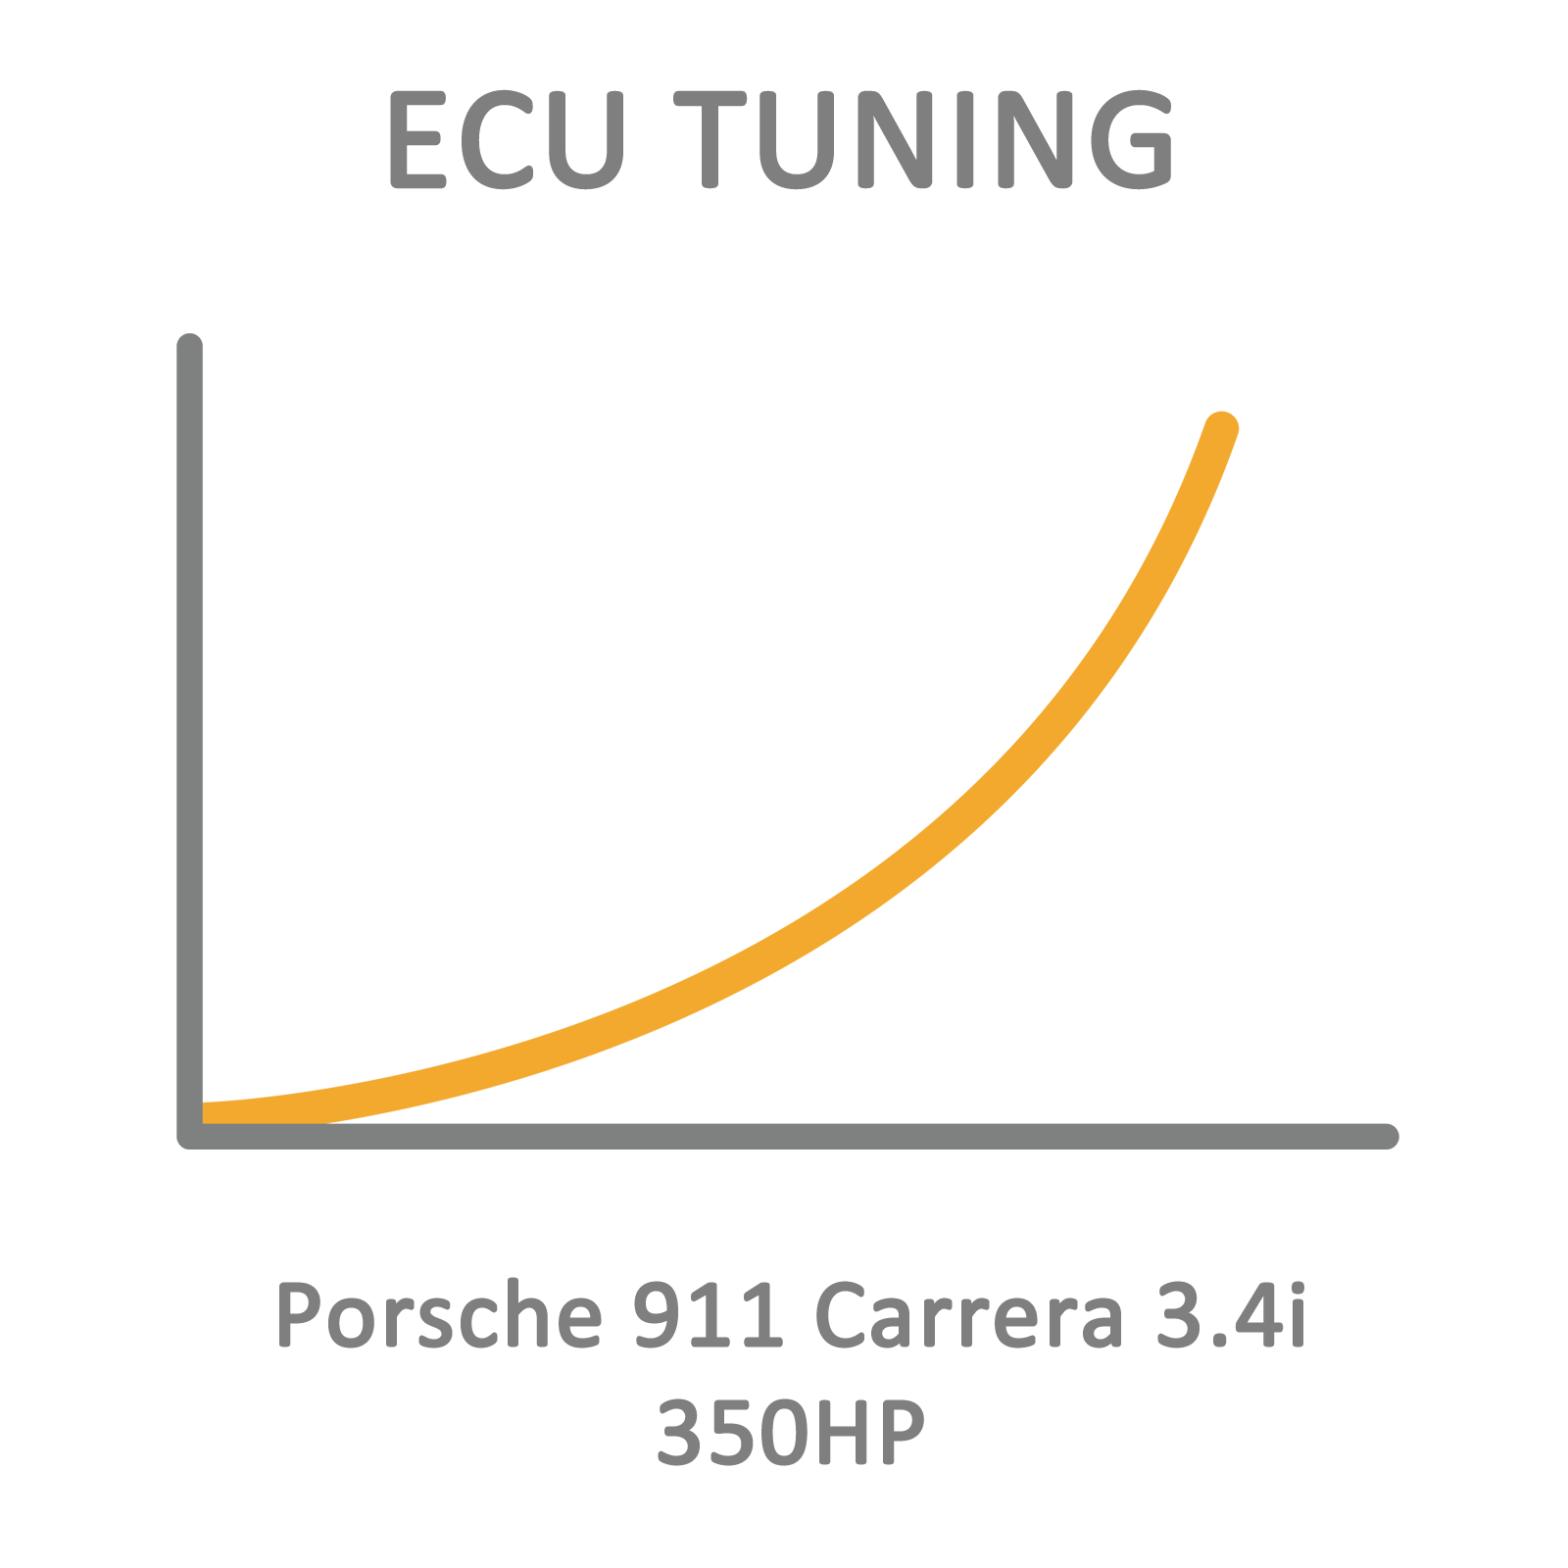 Porsche 911 Carrera 3.4i 350HP ECU Tuning Remapping